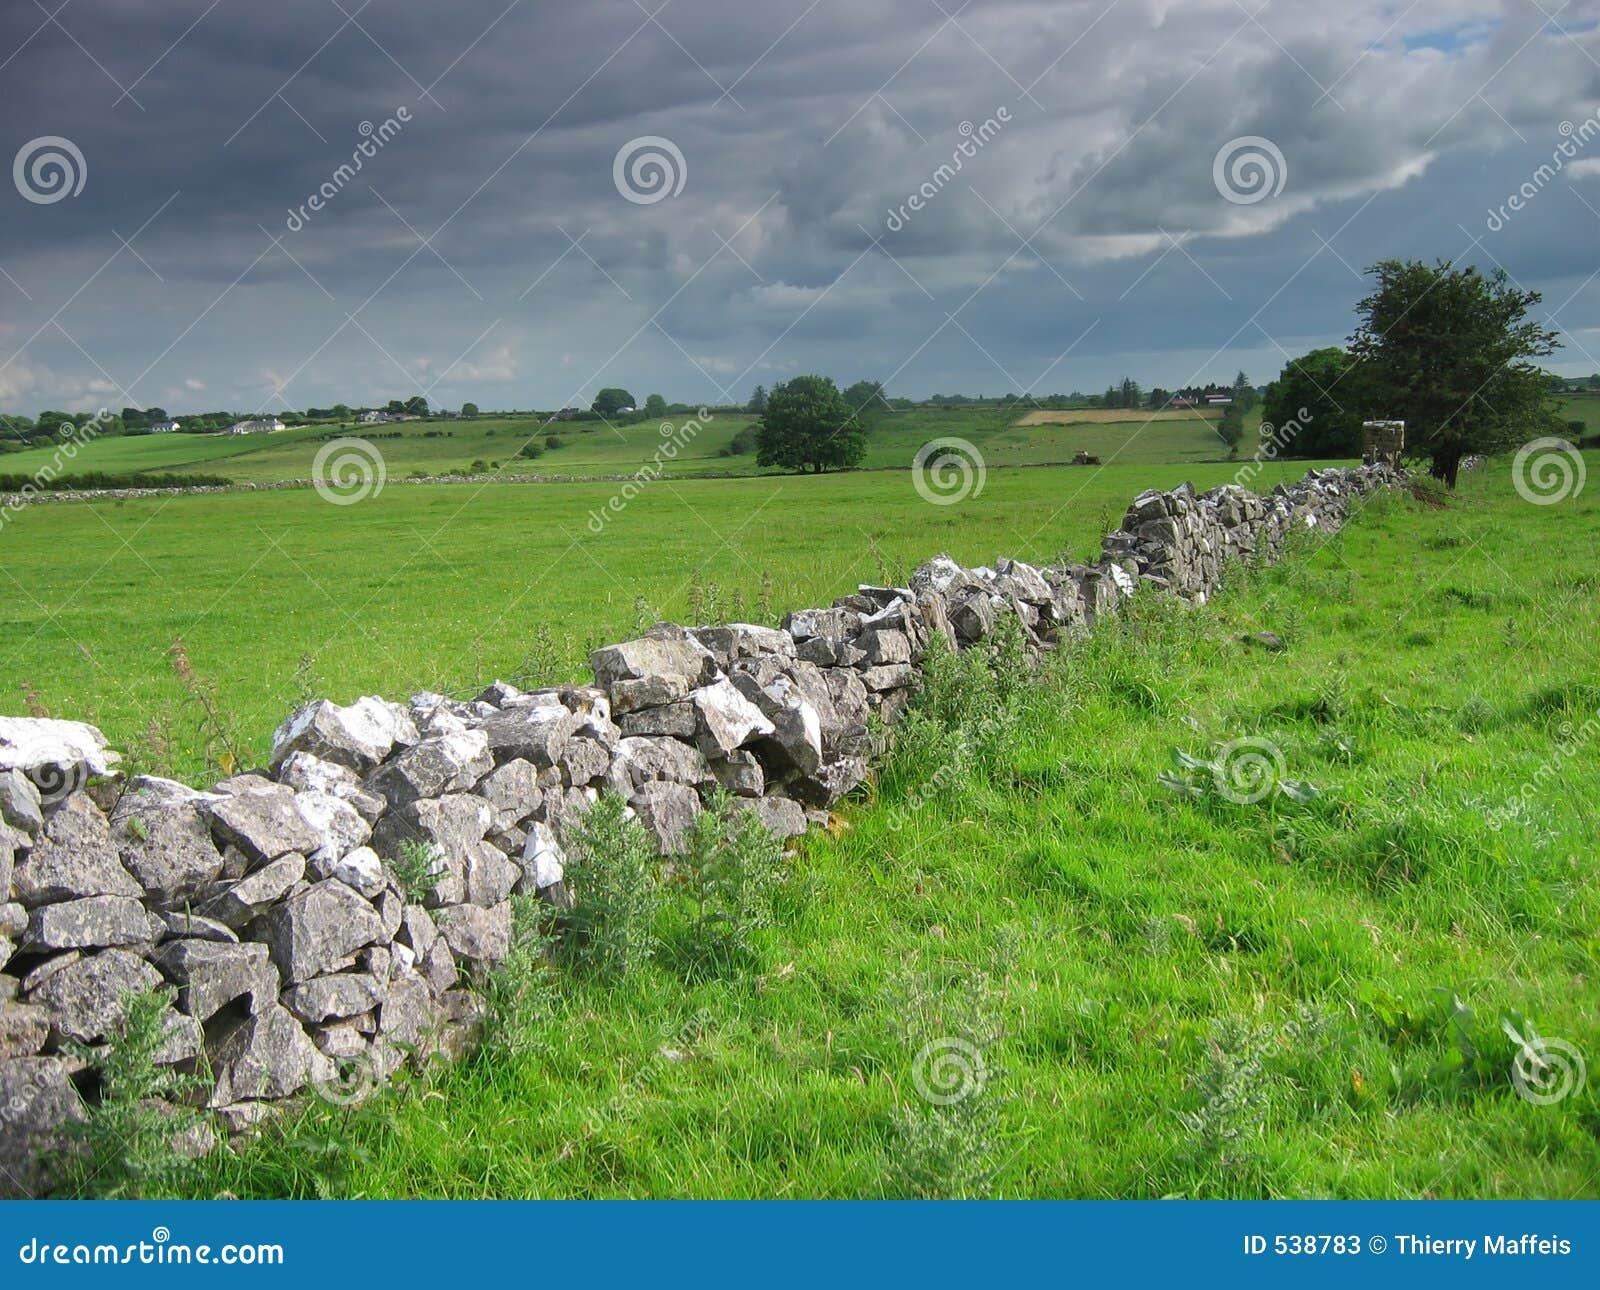 Download 农村的爱尔兰 库存图片. 图片 包括有 庄稼, 牛奶店, 乡下, 问题的, 醉汉, 牛奶, 横向, 肥沃, 农场 - 538783